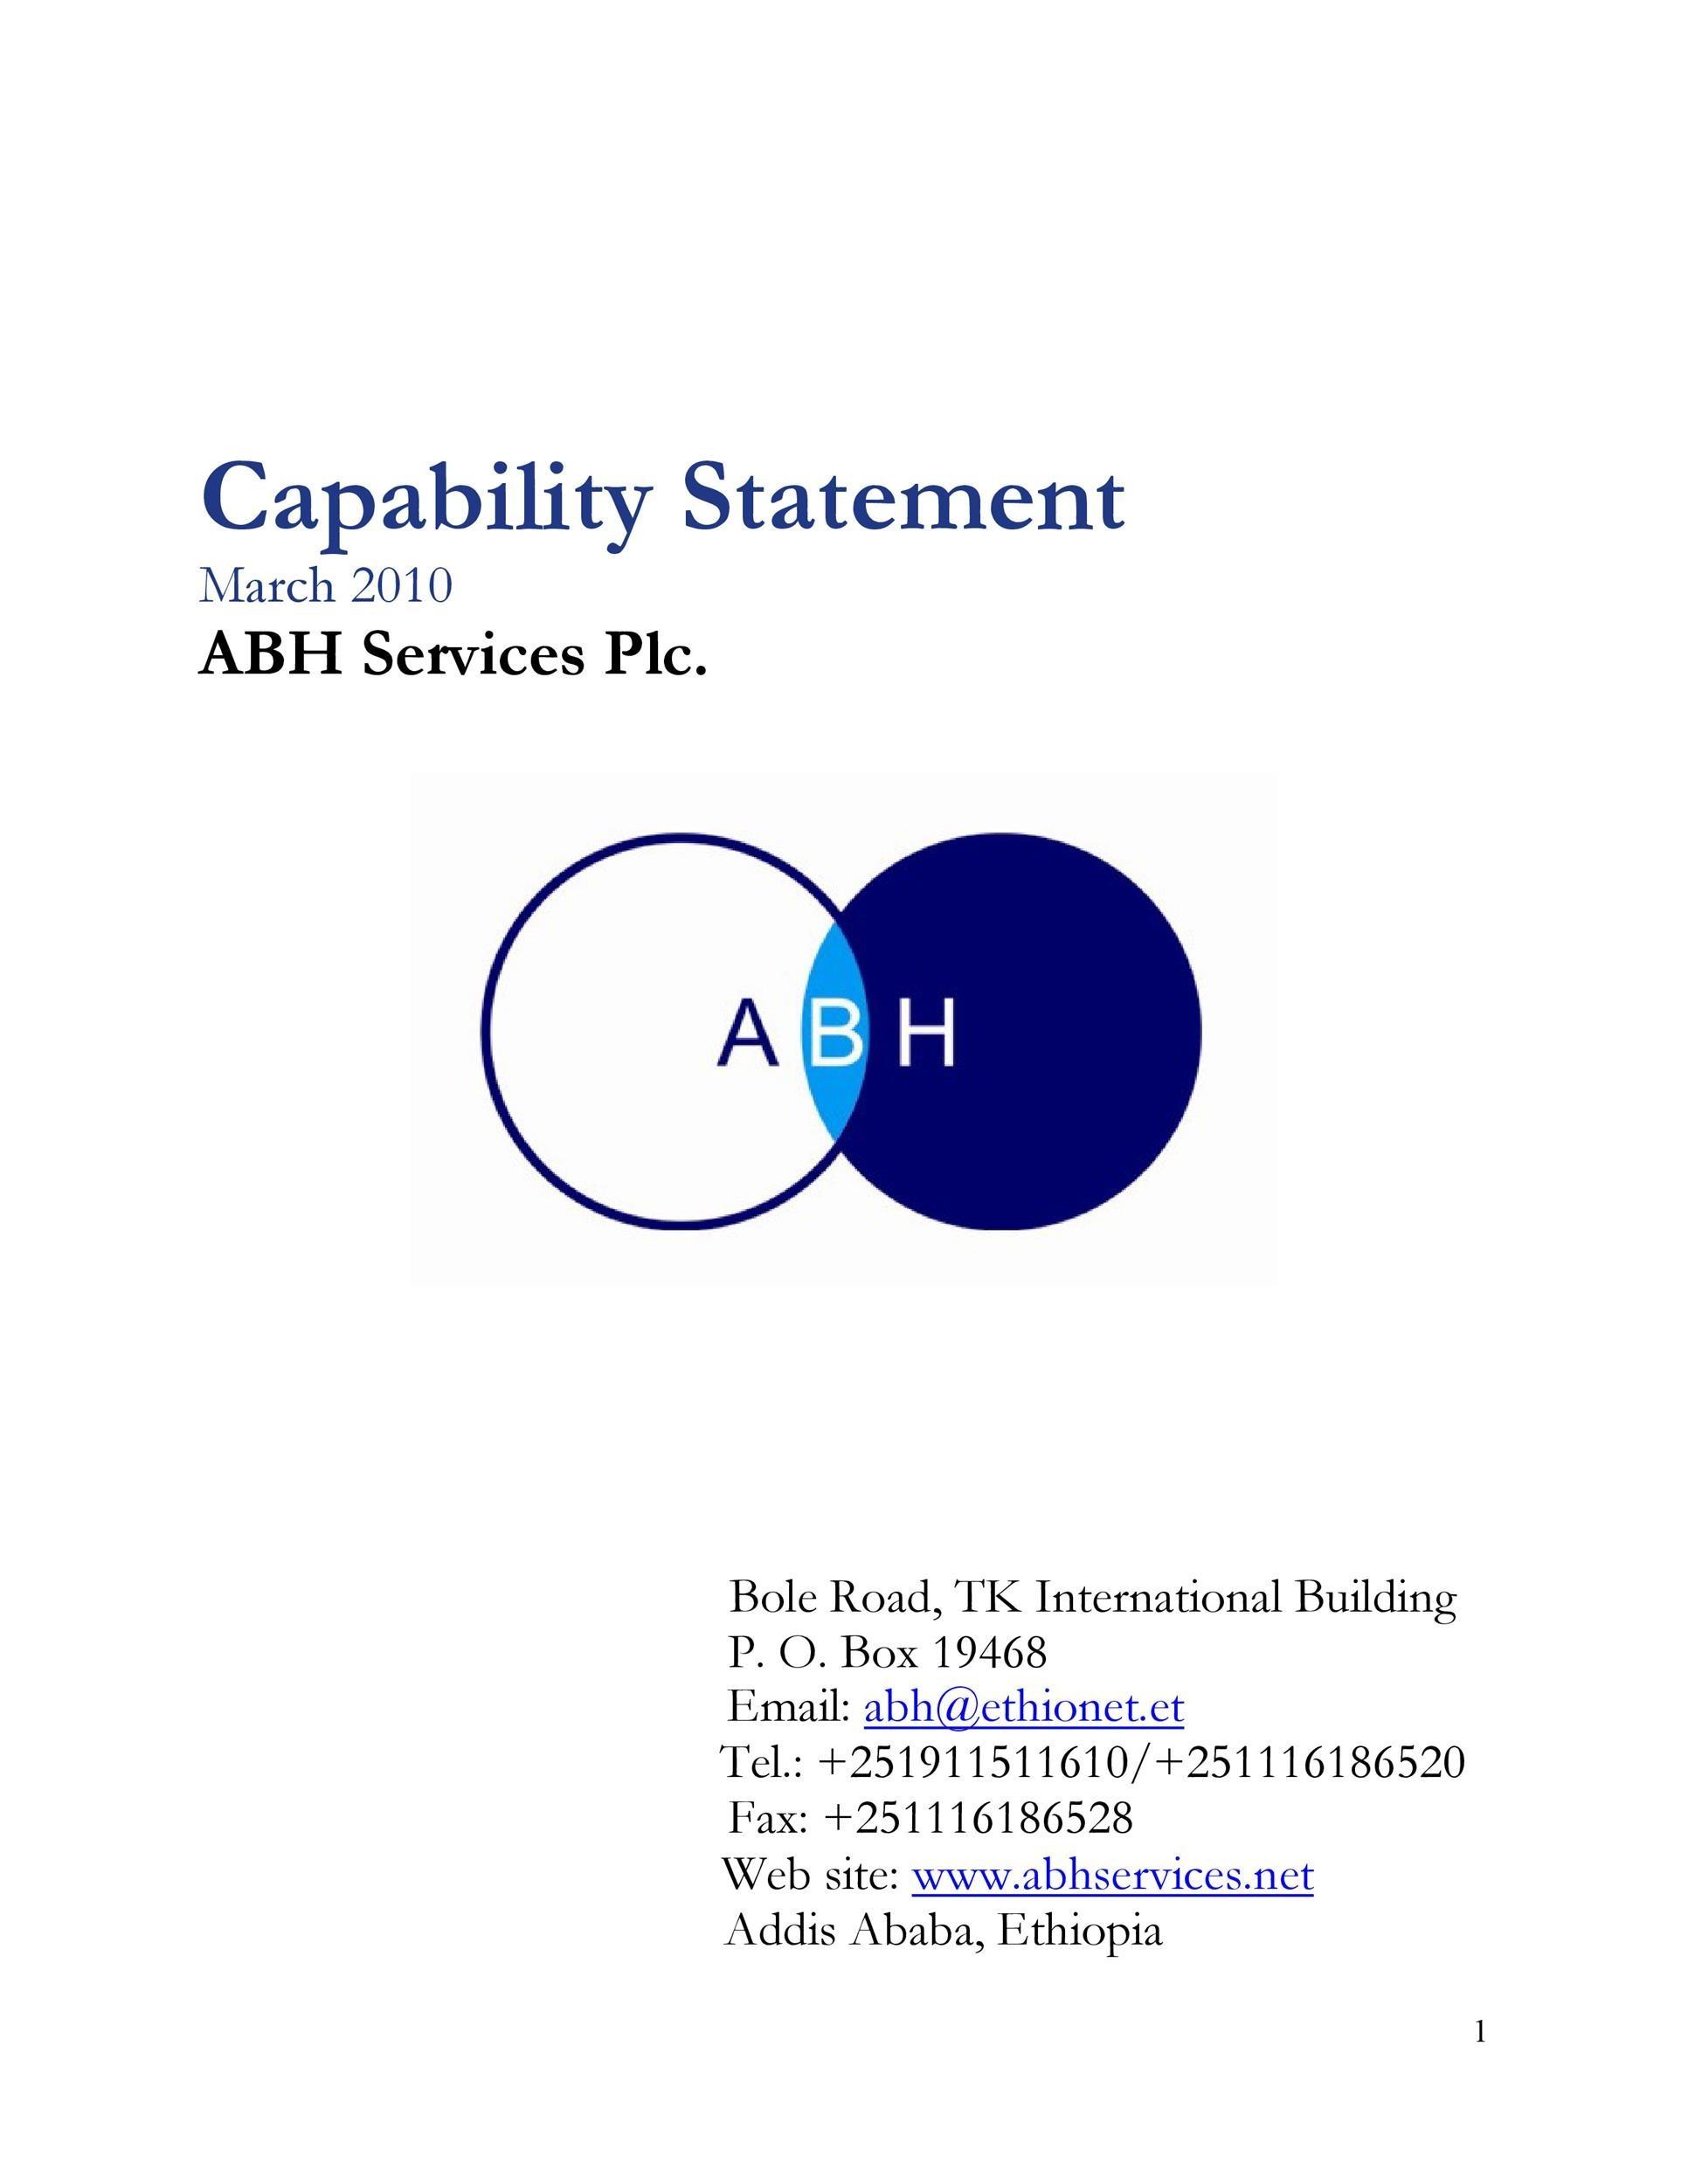 Free capability statement 37